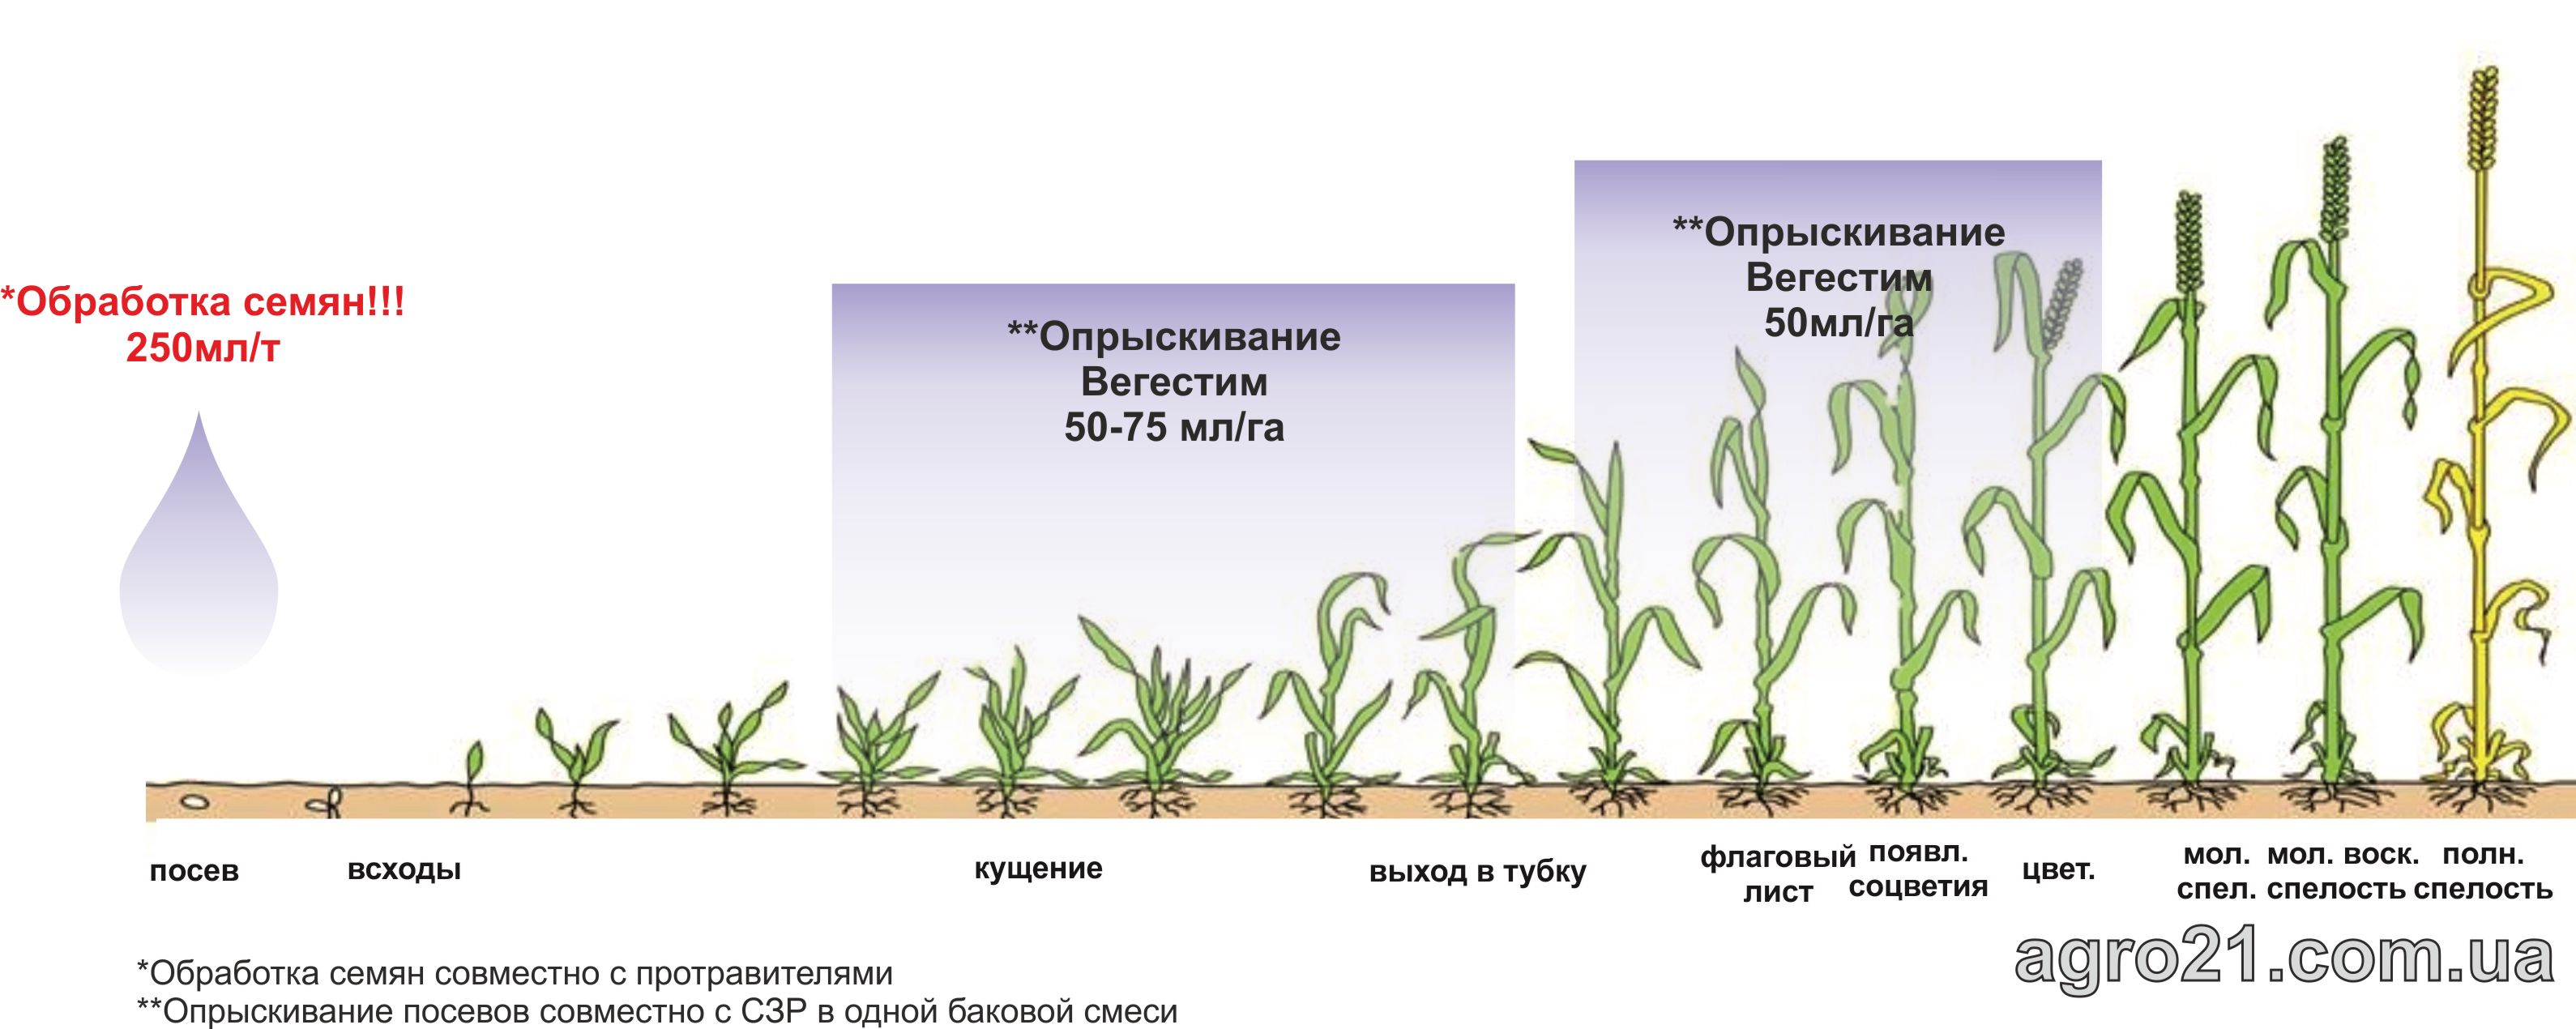 Вегестим. Схема застосування стимулятору росту рослин на зернових.